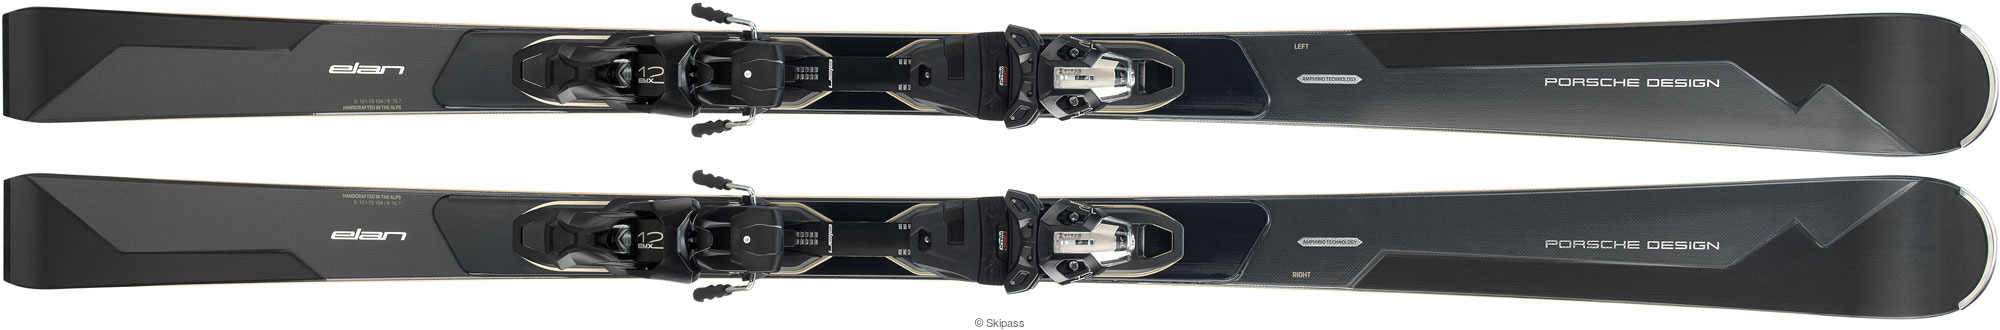 Ski Elan Amphibio Porsche Fusion X + EMX 12.0 2020 160